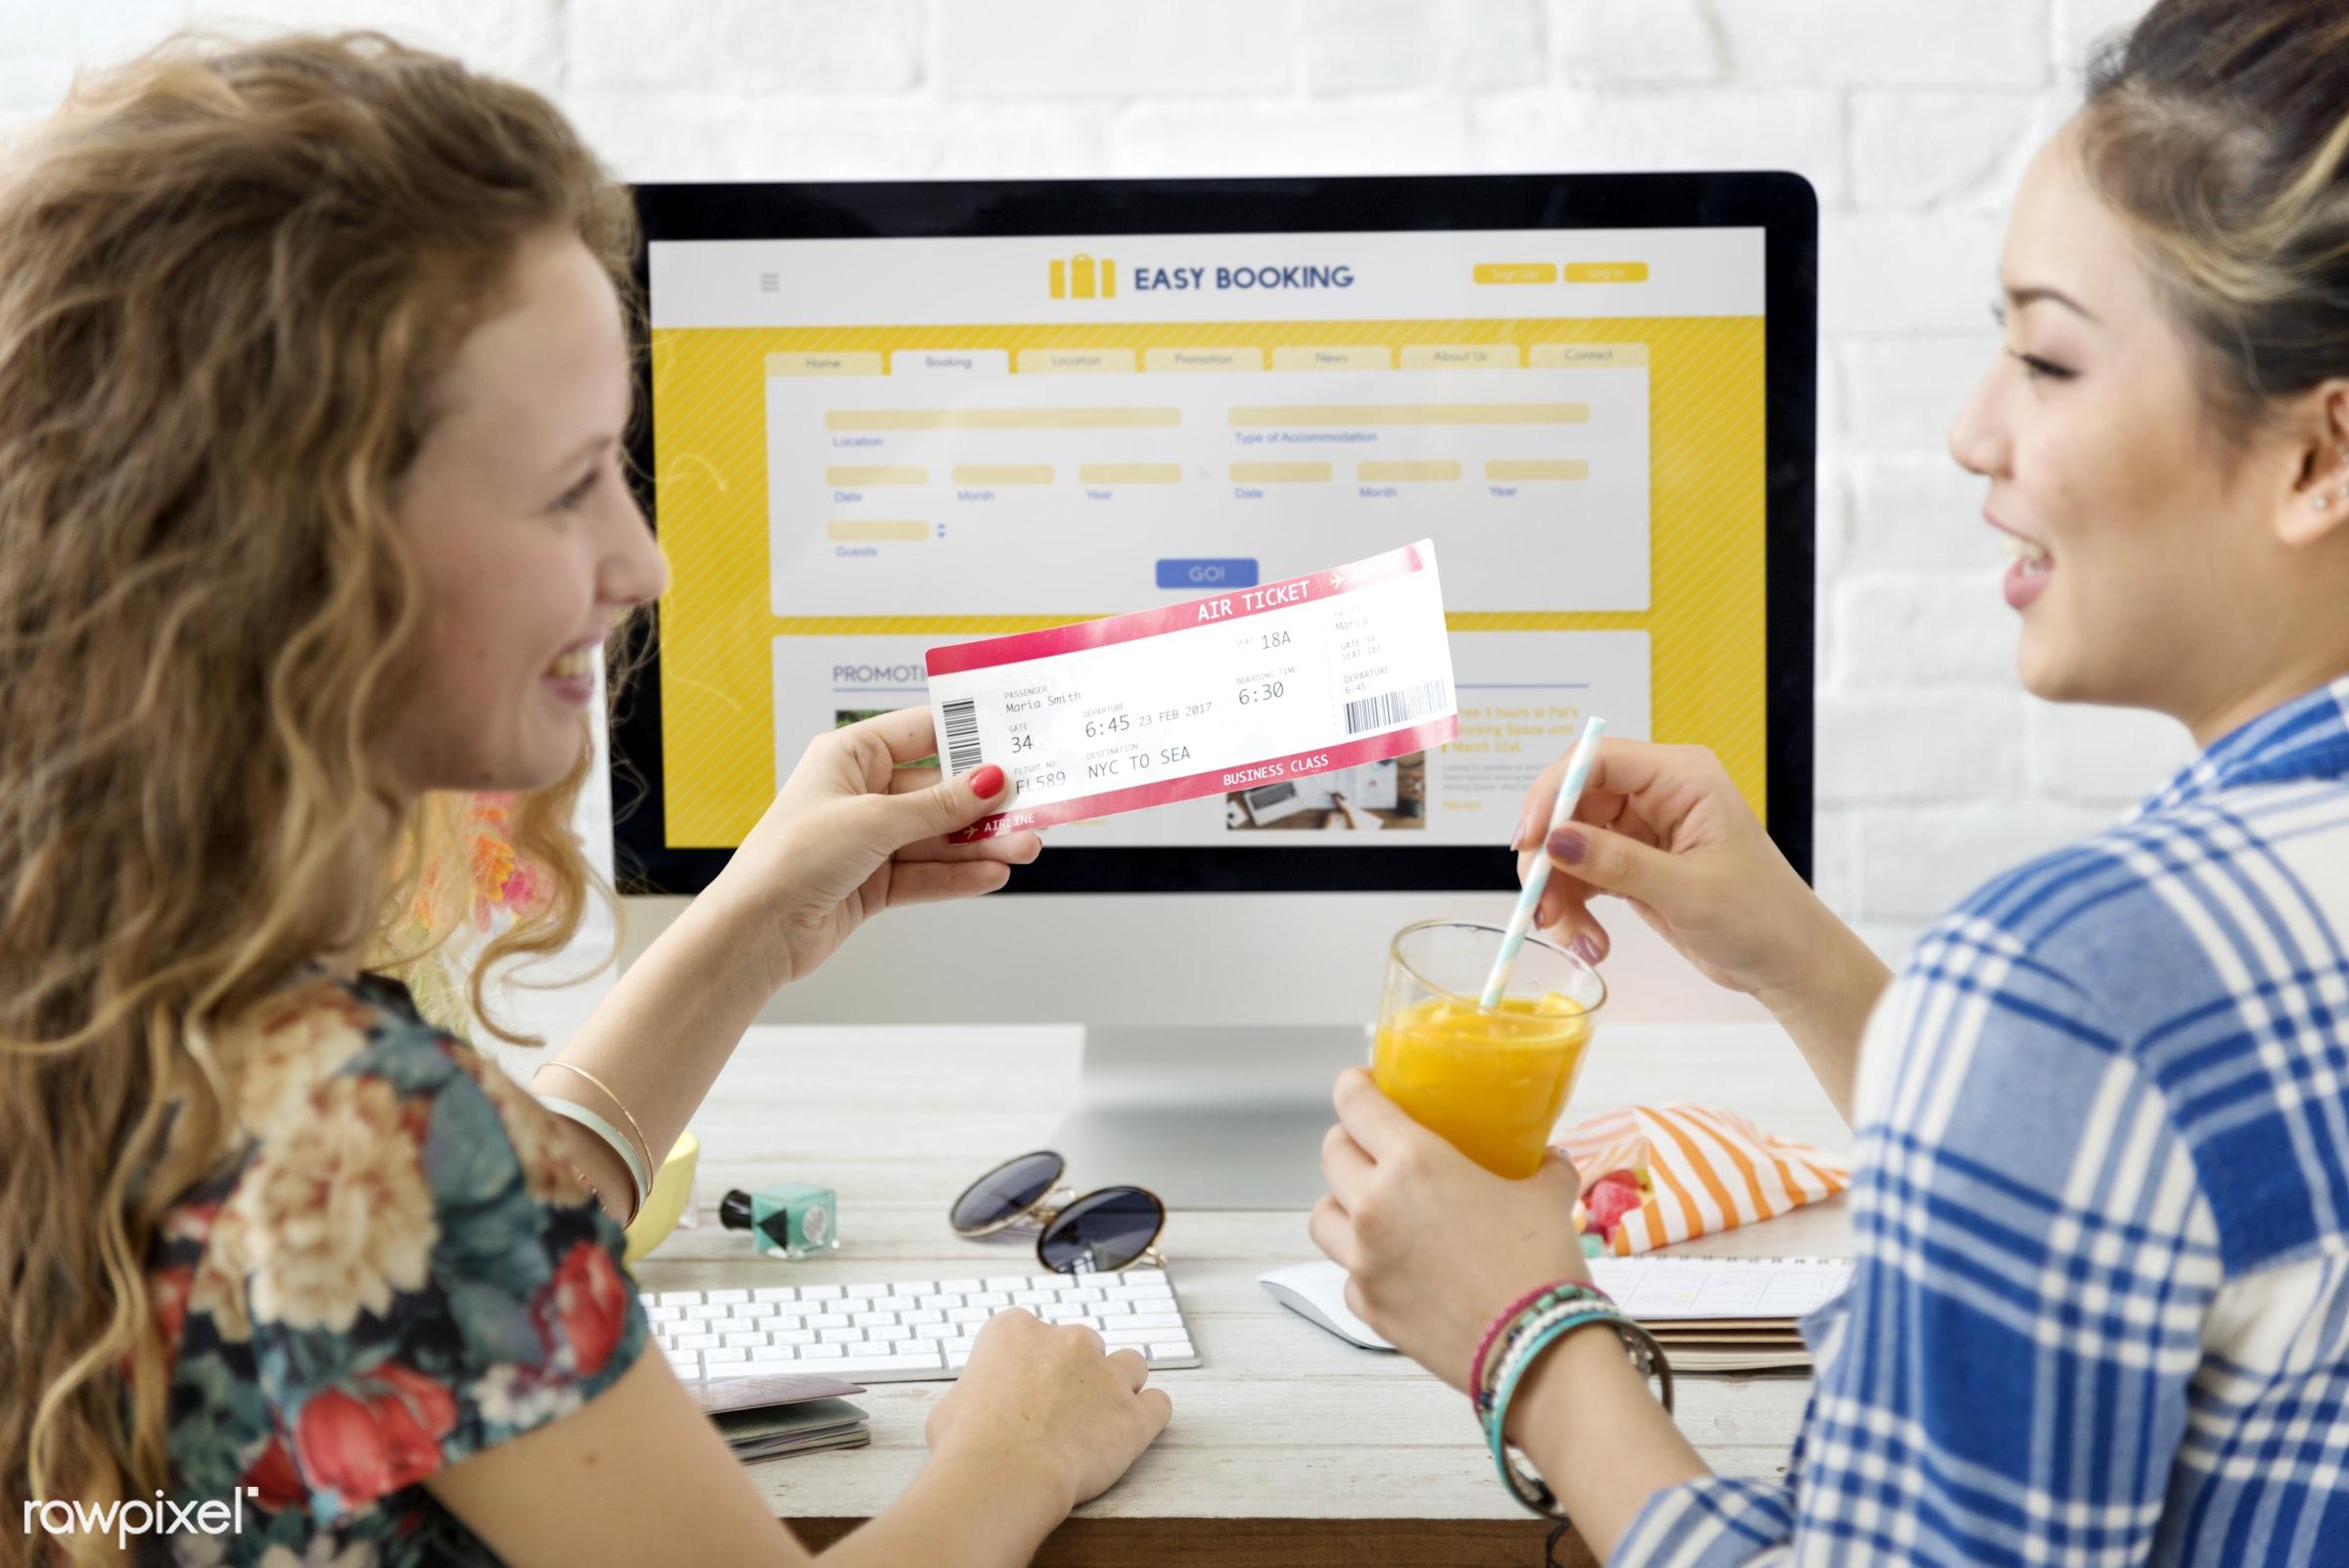 ticket, booking, computer, destination, device, digital, flight, fly, form, friends, friendship, holiday, hotel, internet,...